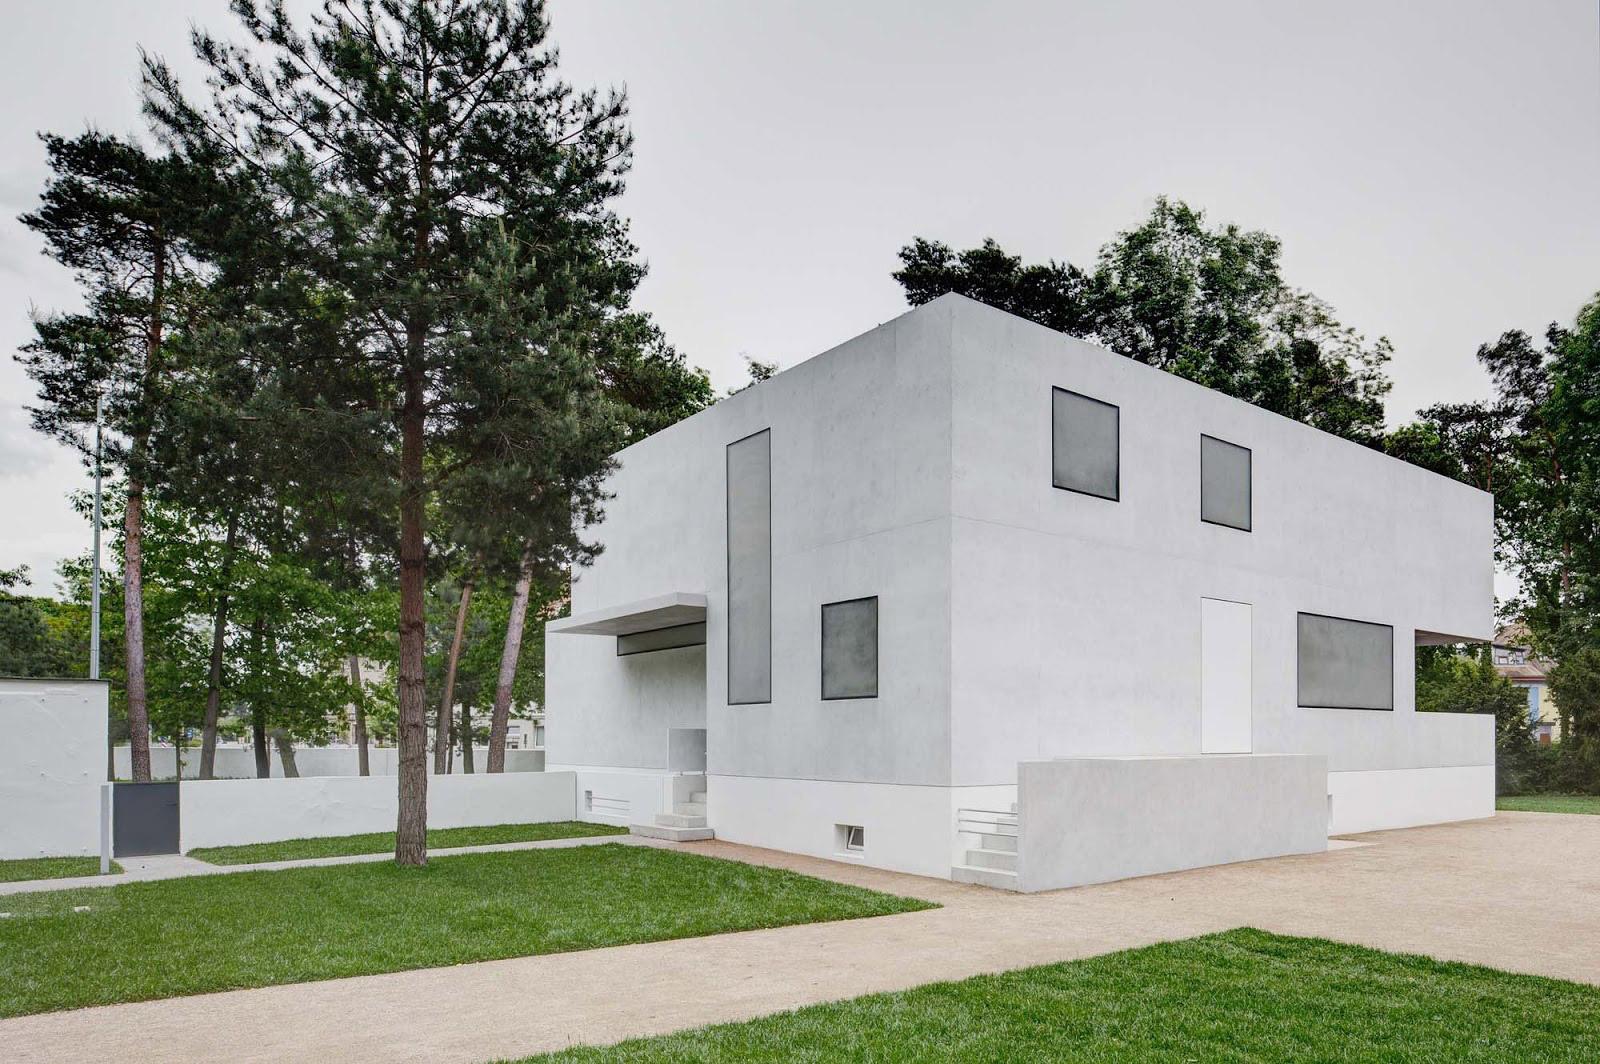 Bauhaus Reinterpreted Not Reconstructed In Dessau Uncube